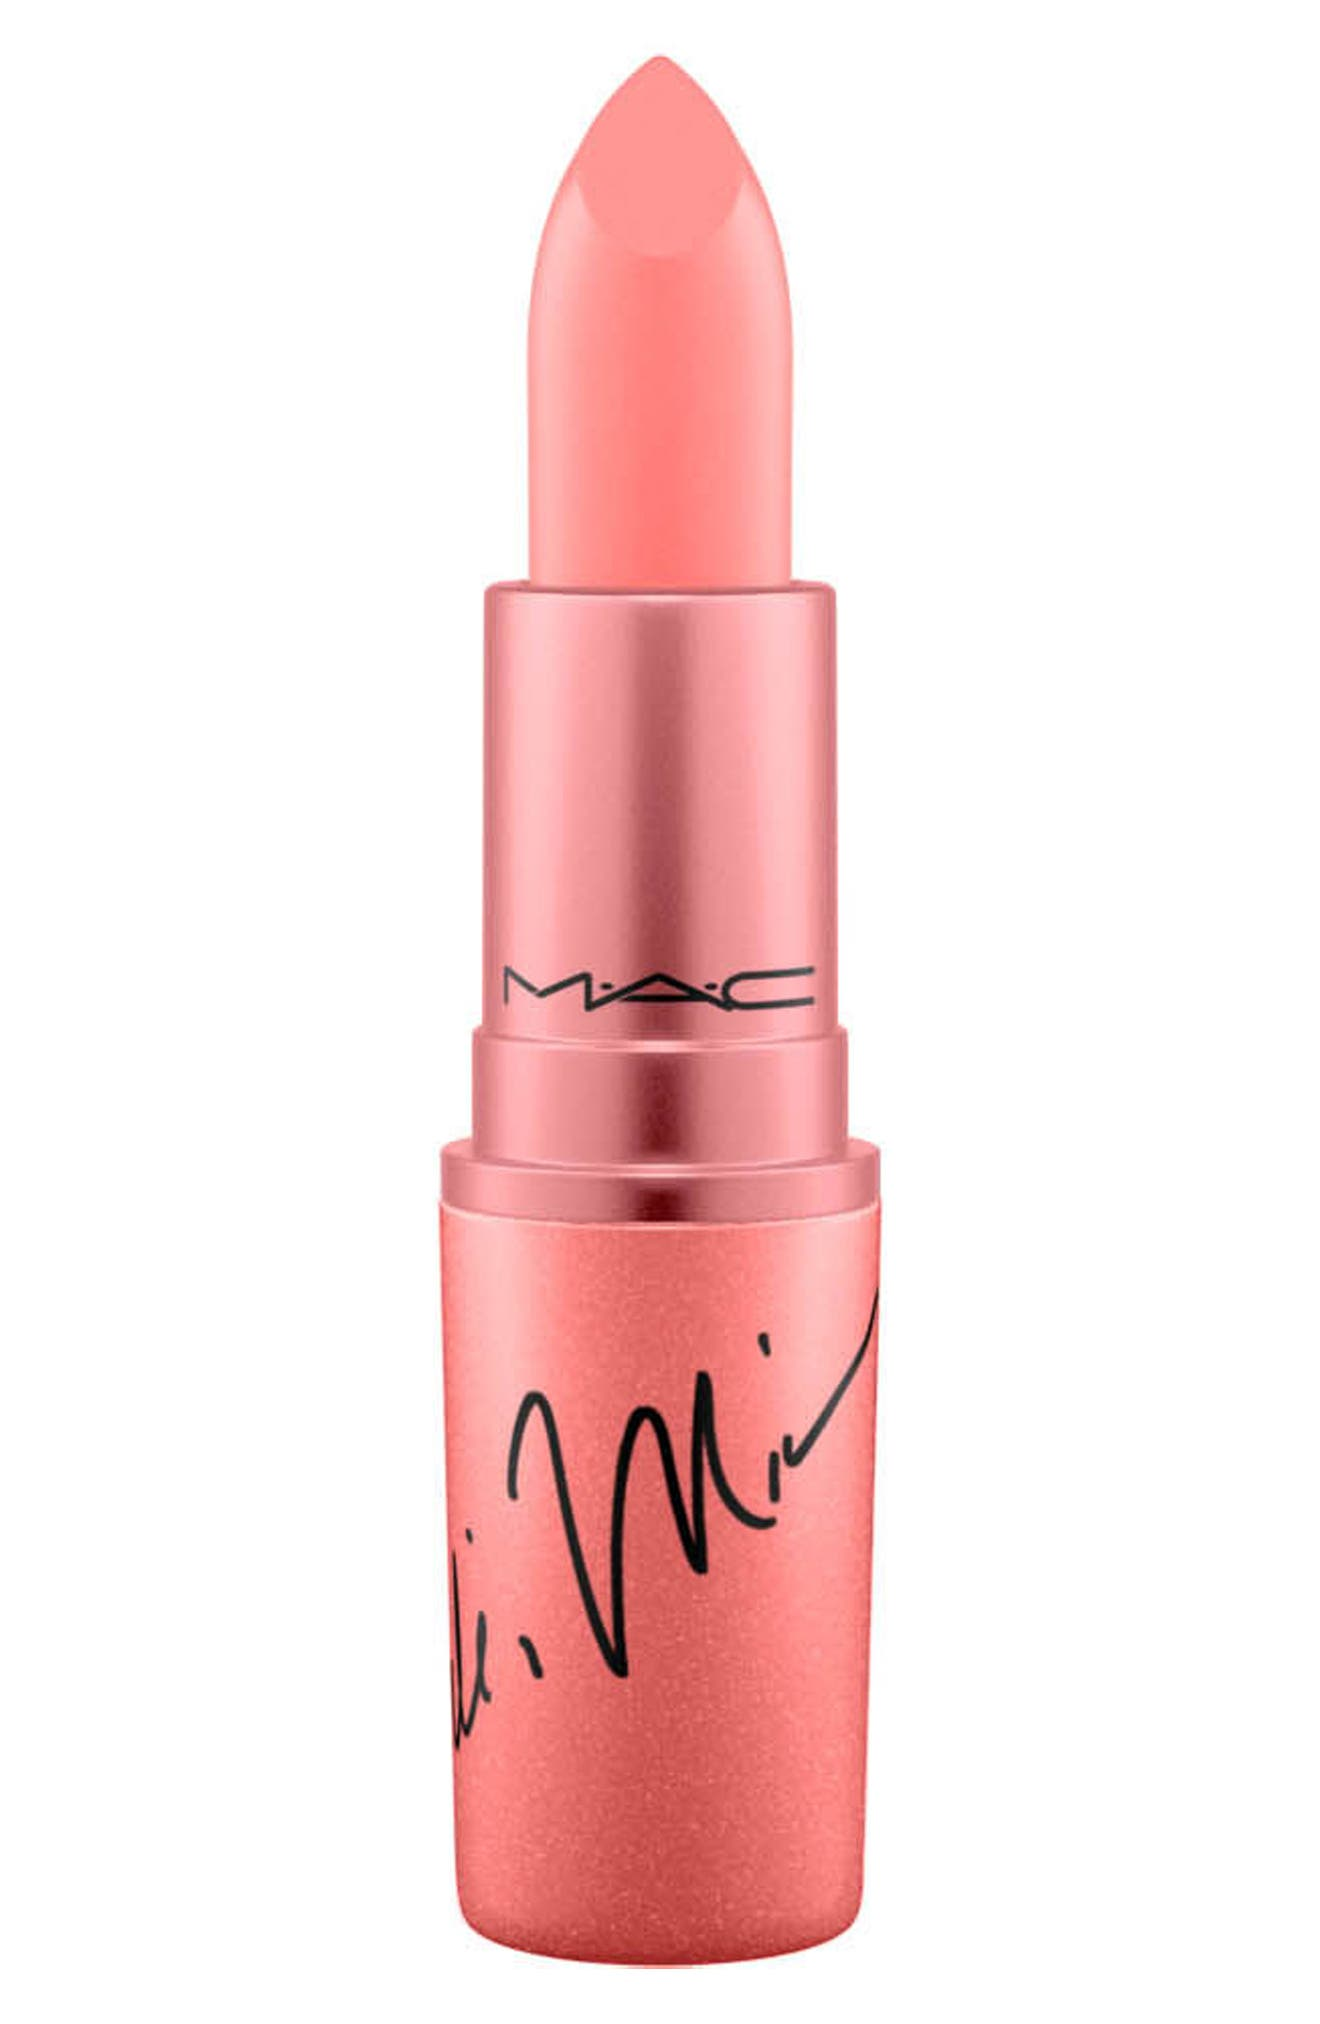 MAC x Nicki Minaj Lipstick (Limited Edition)